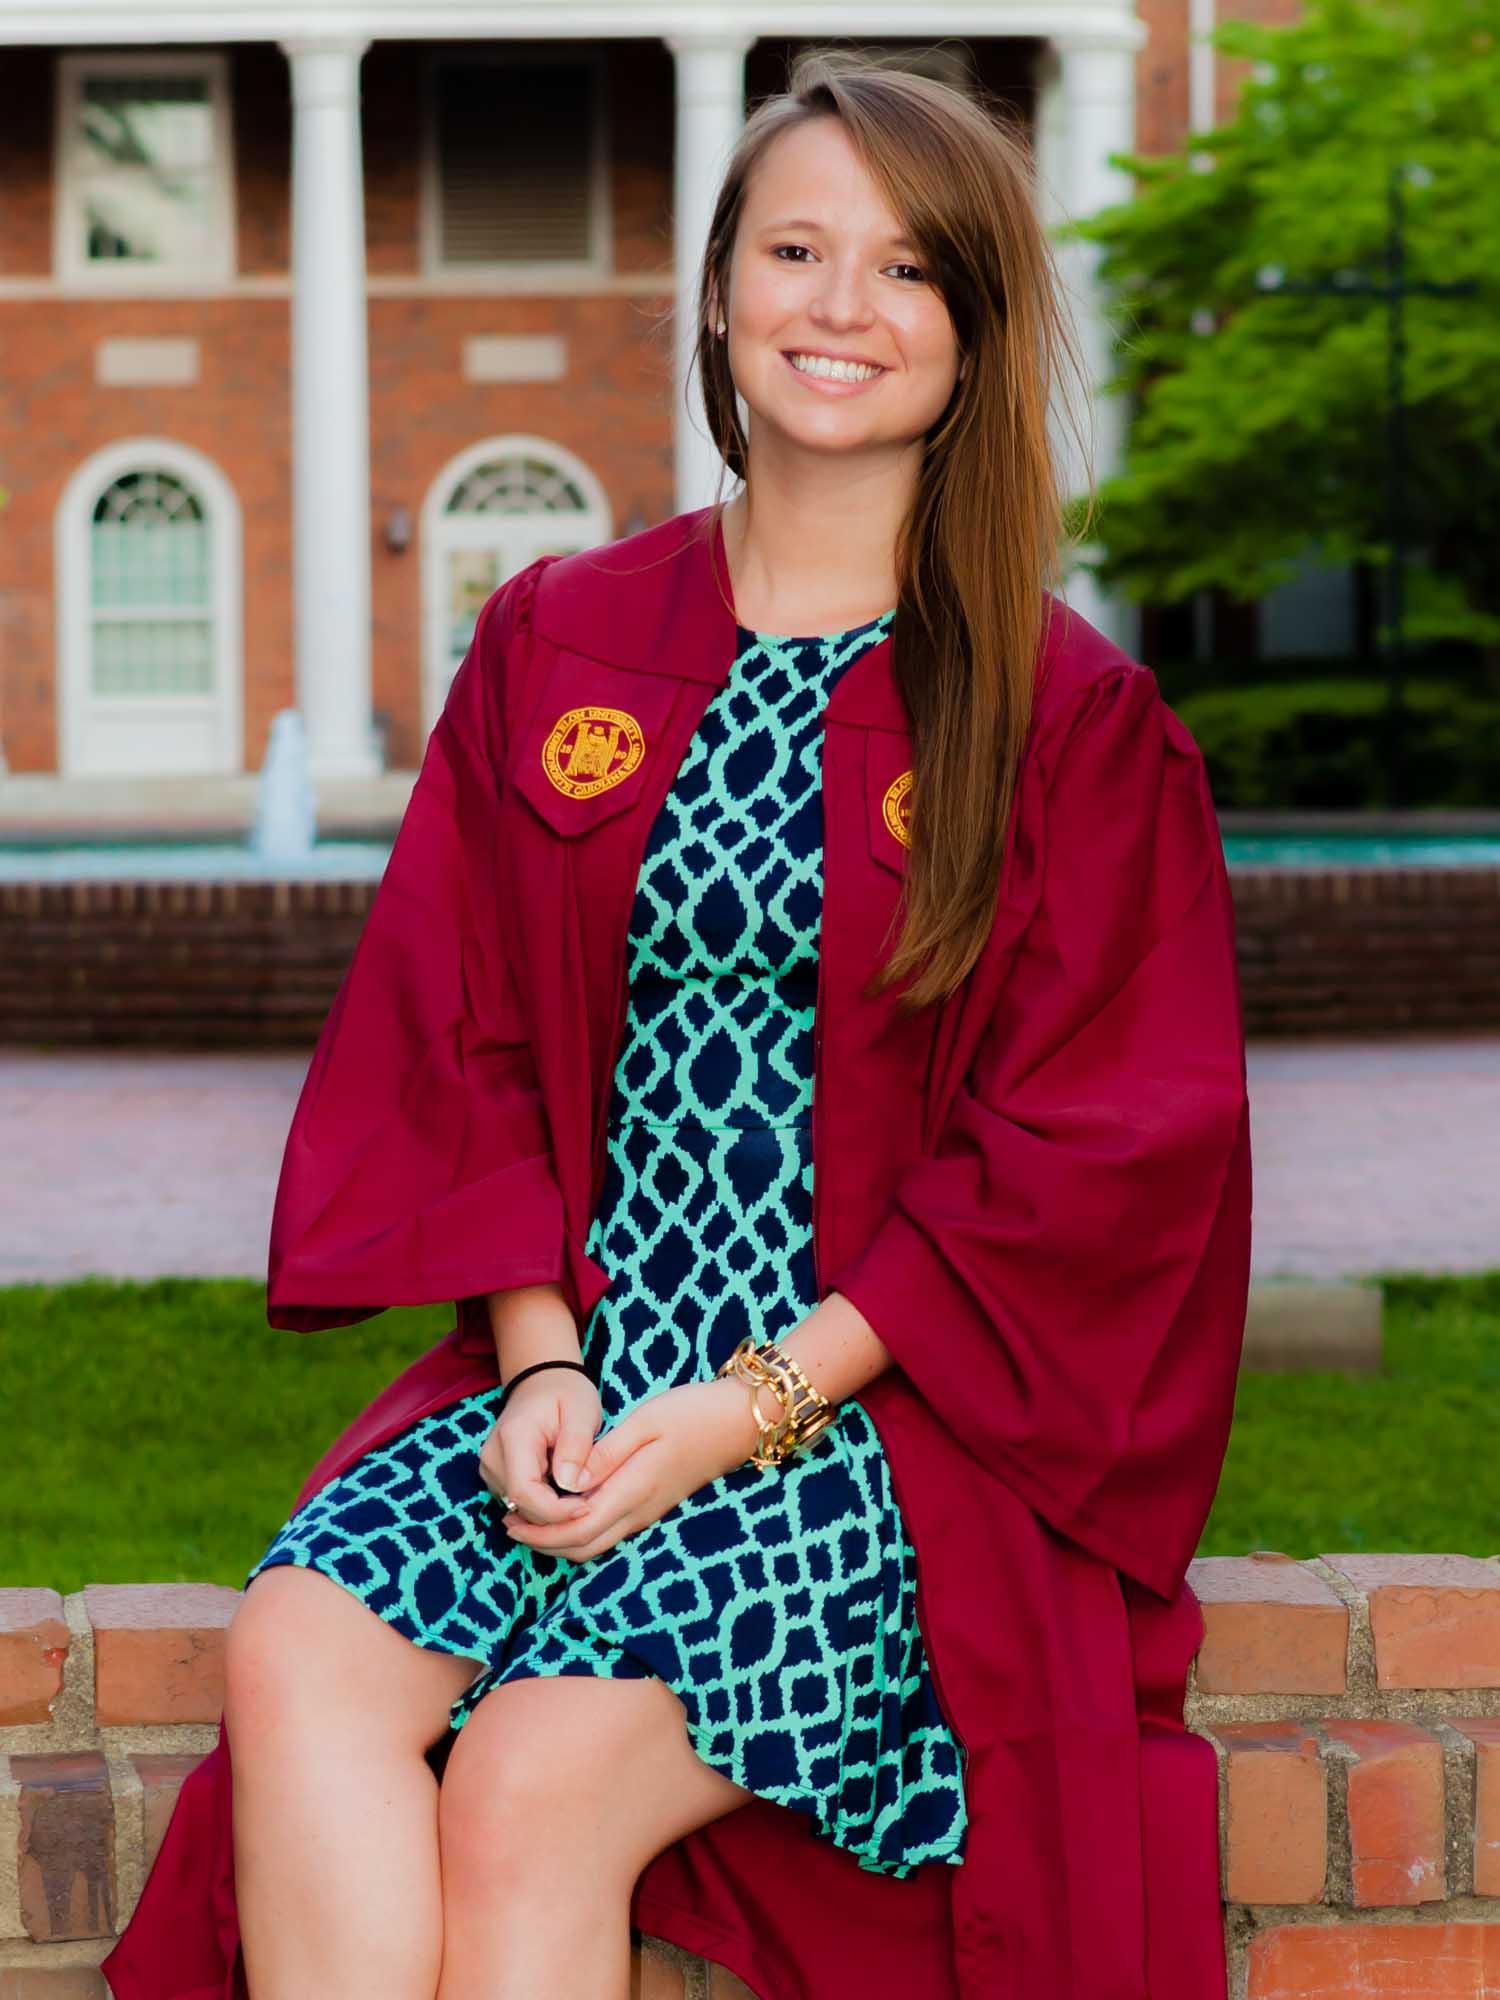 573-Becca & Friends Elon Graduation Portraits_.jpg